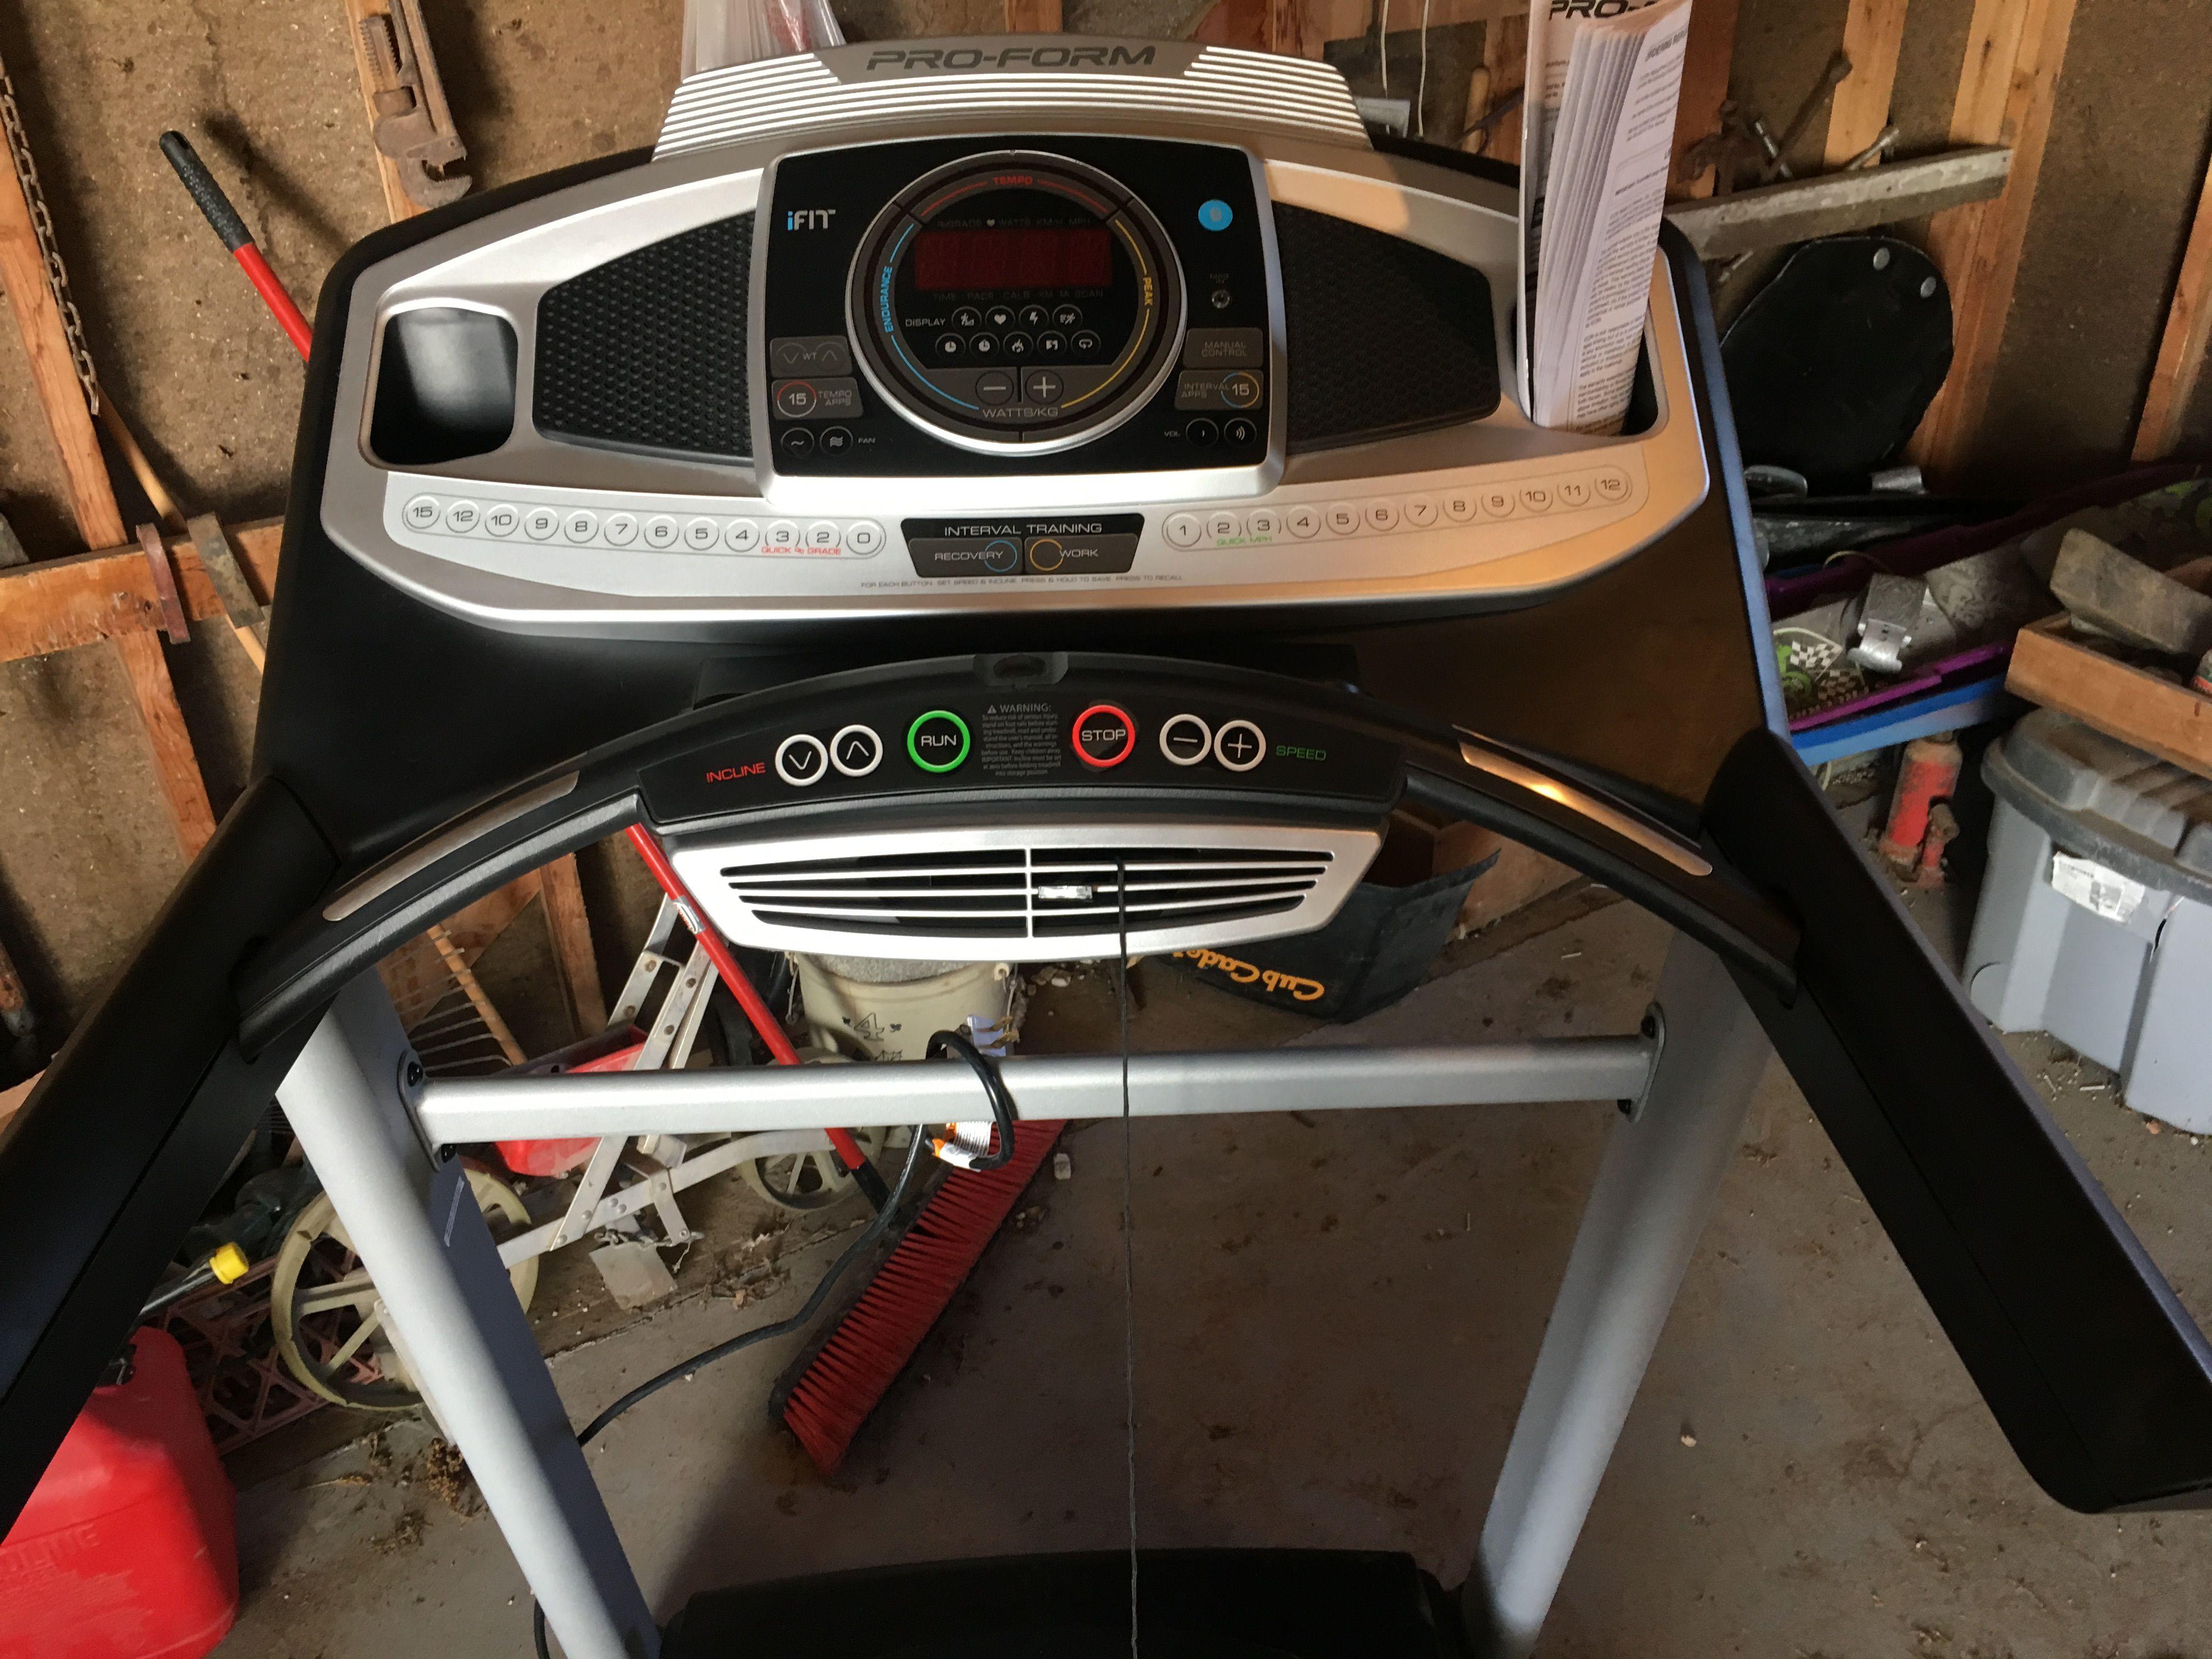 Treadmill image 1